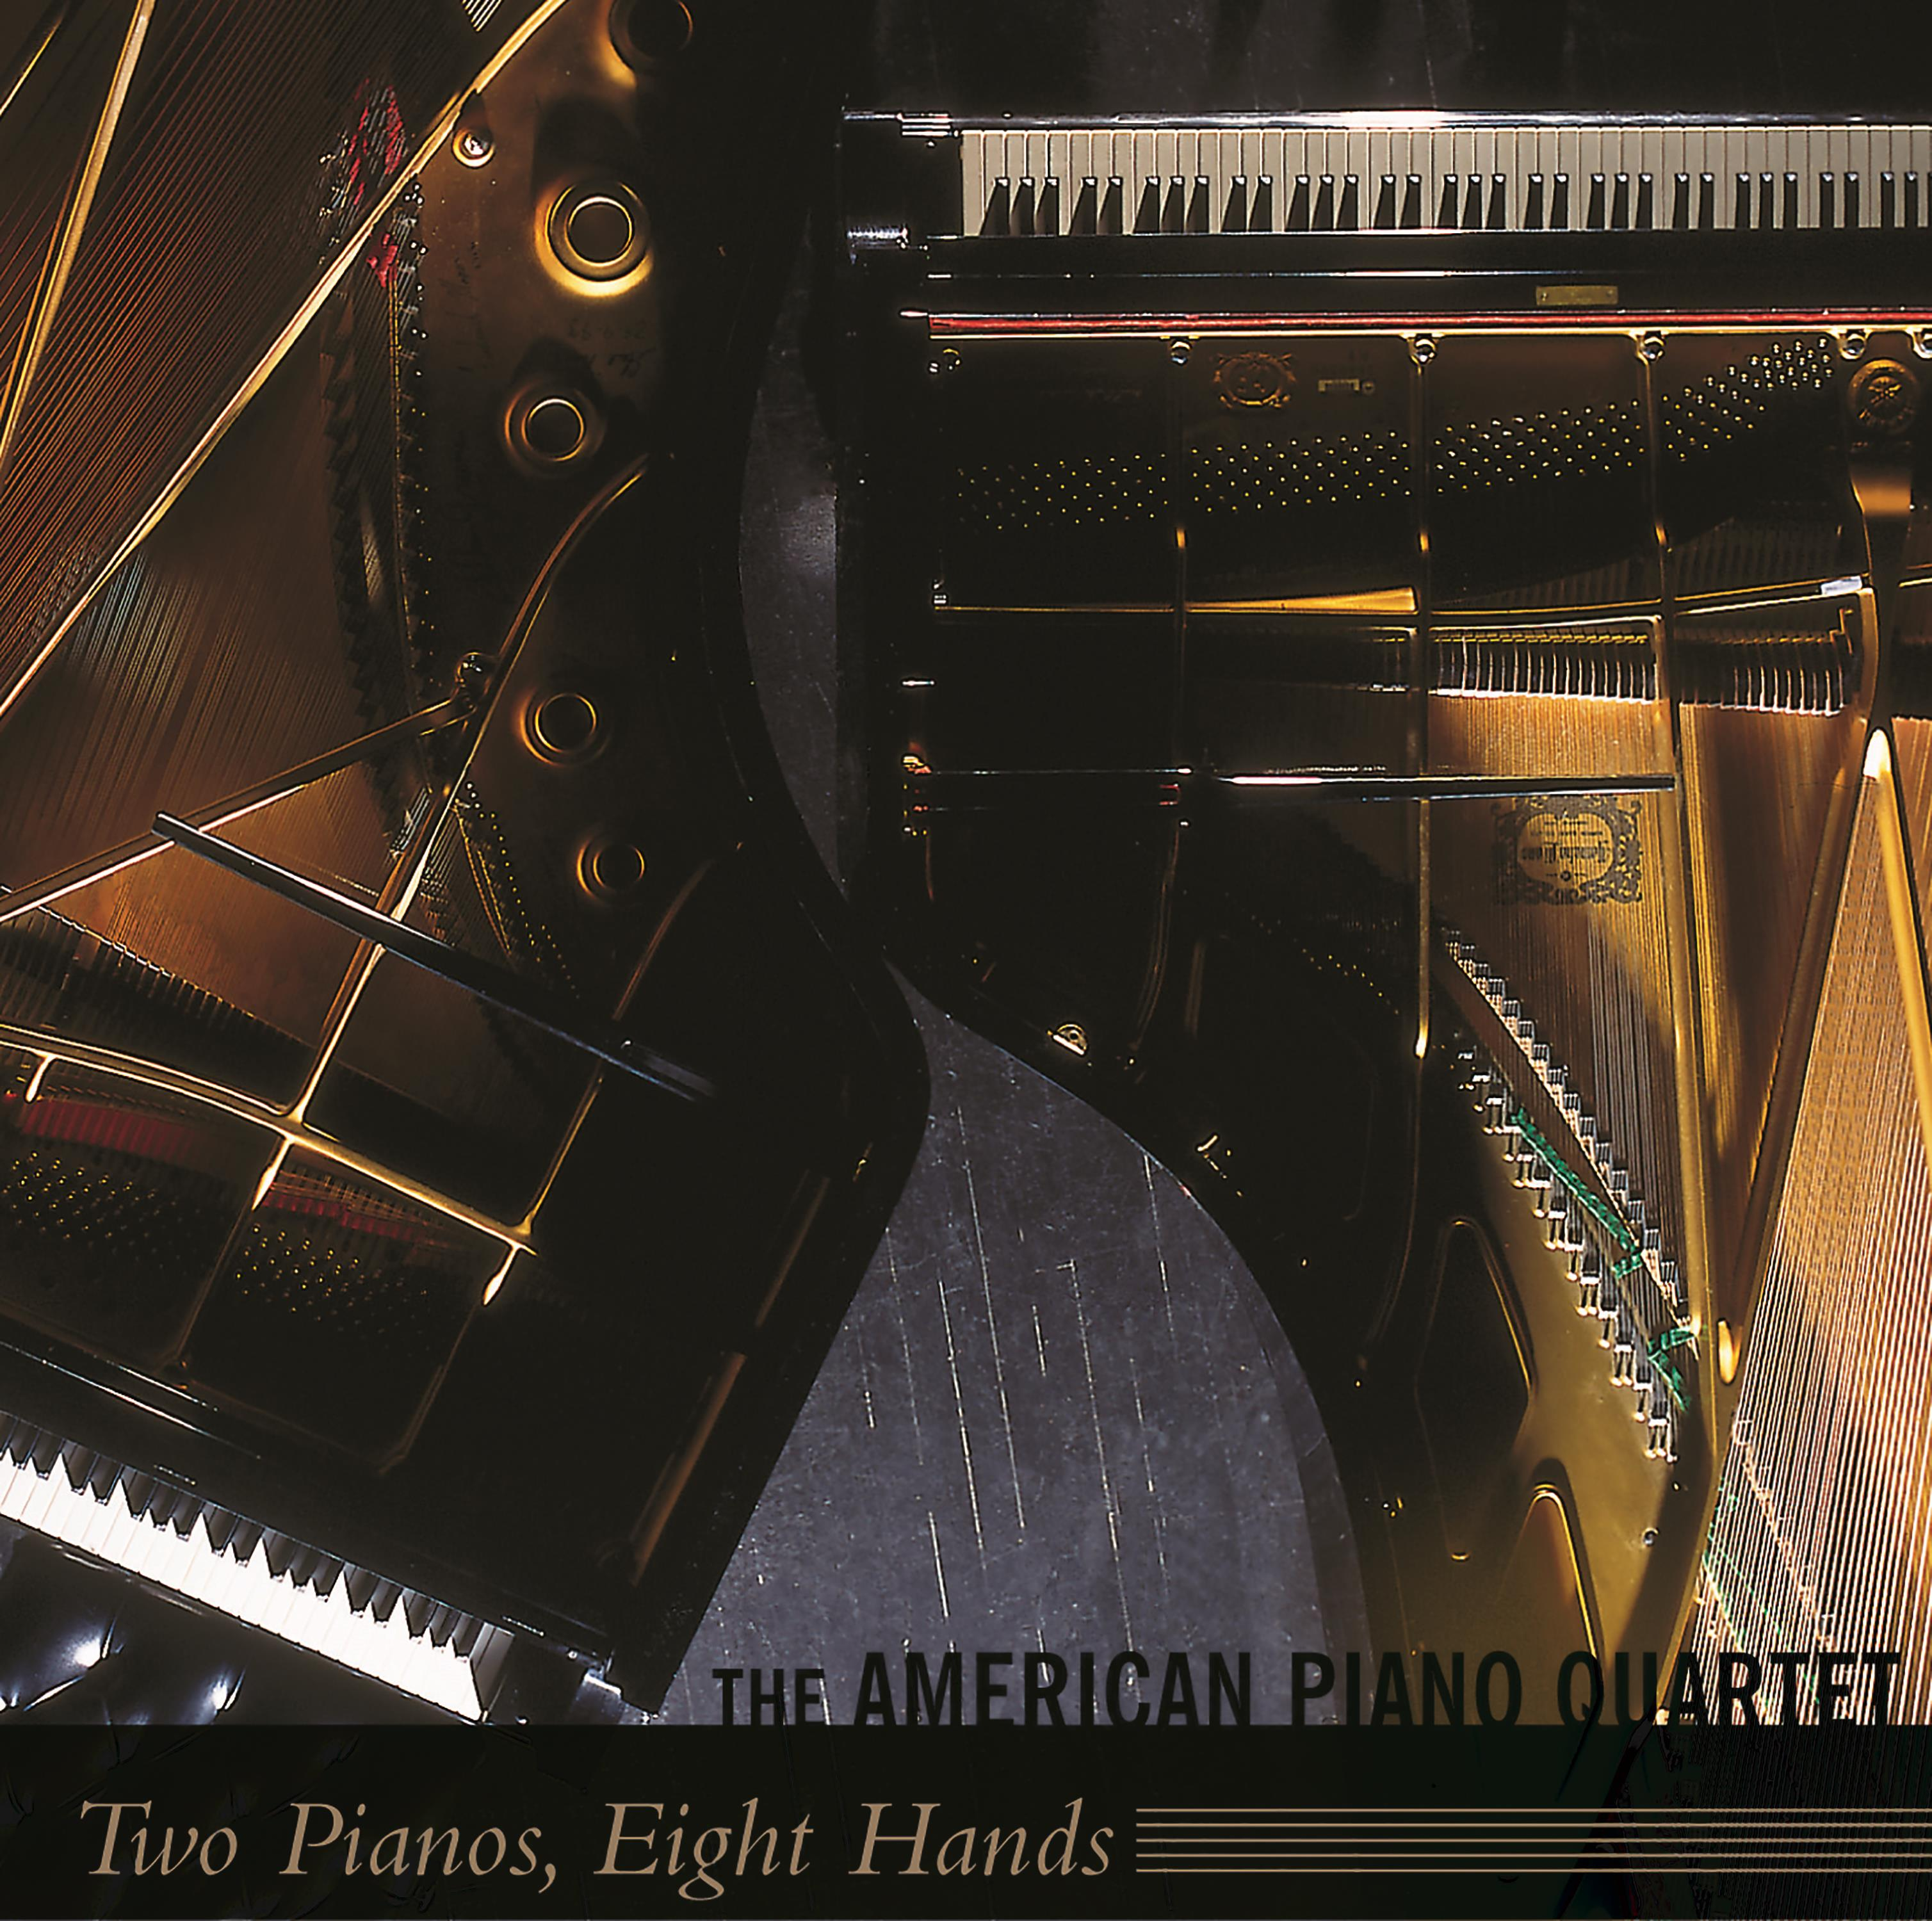 2 Pianos, 8 Hands